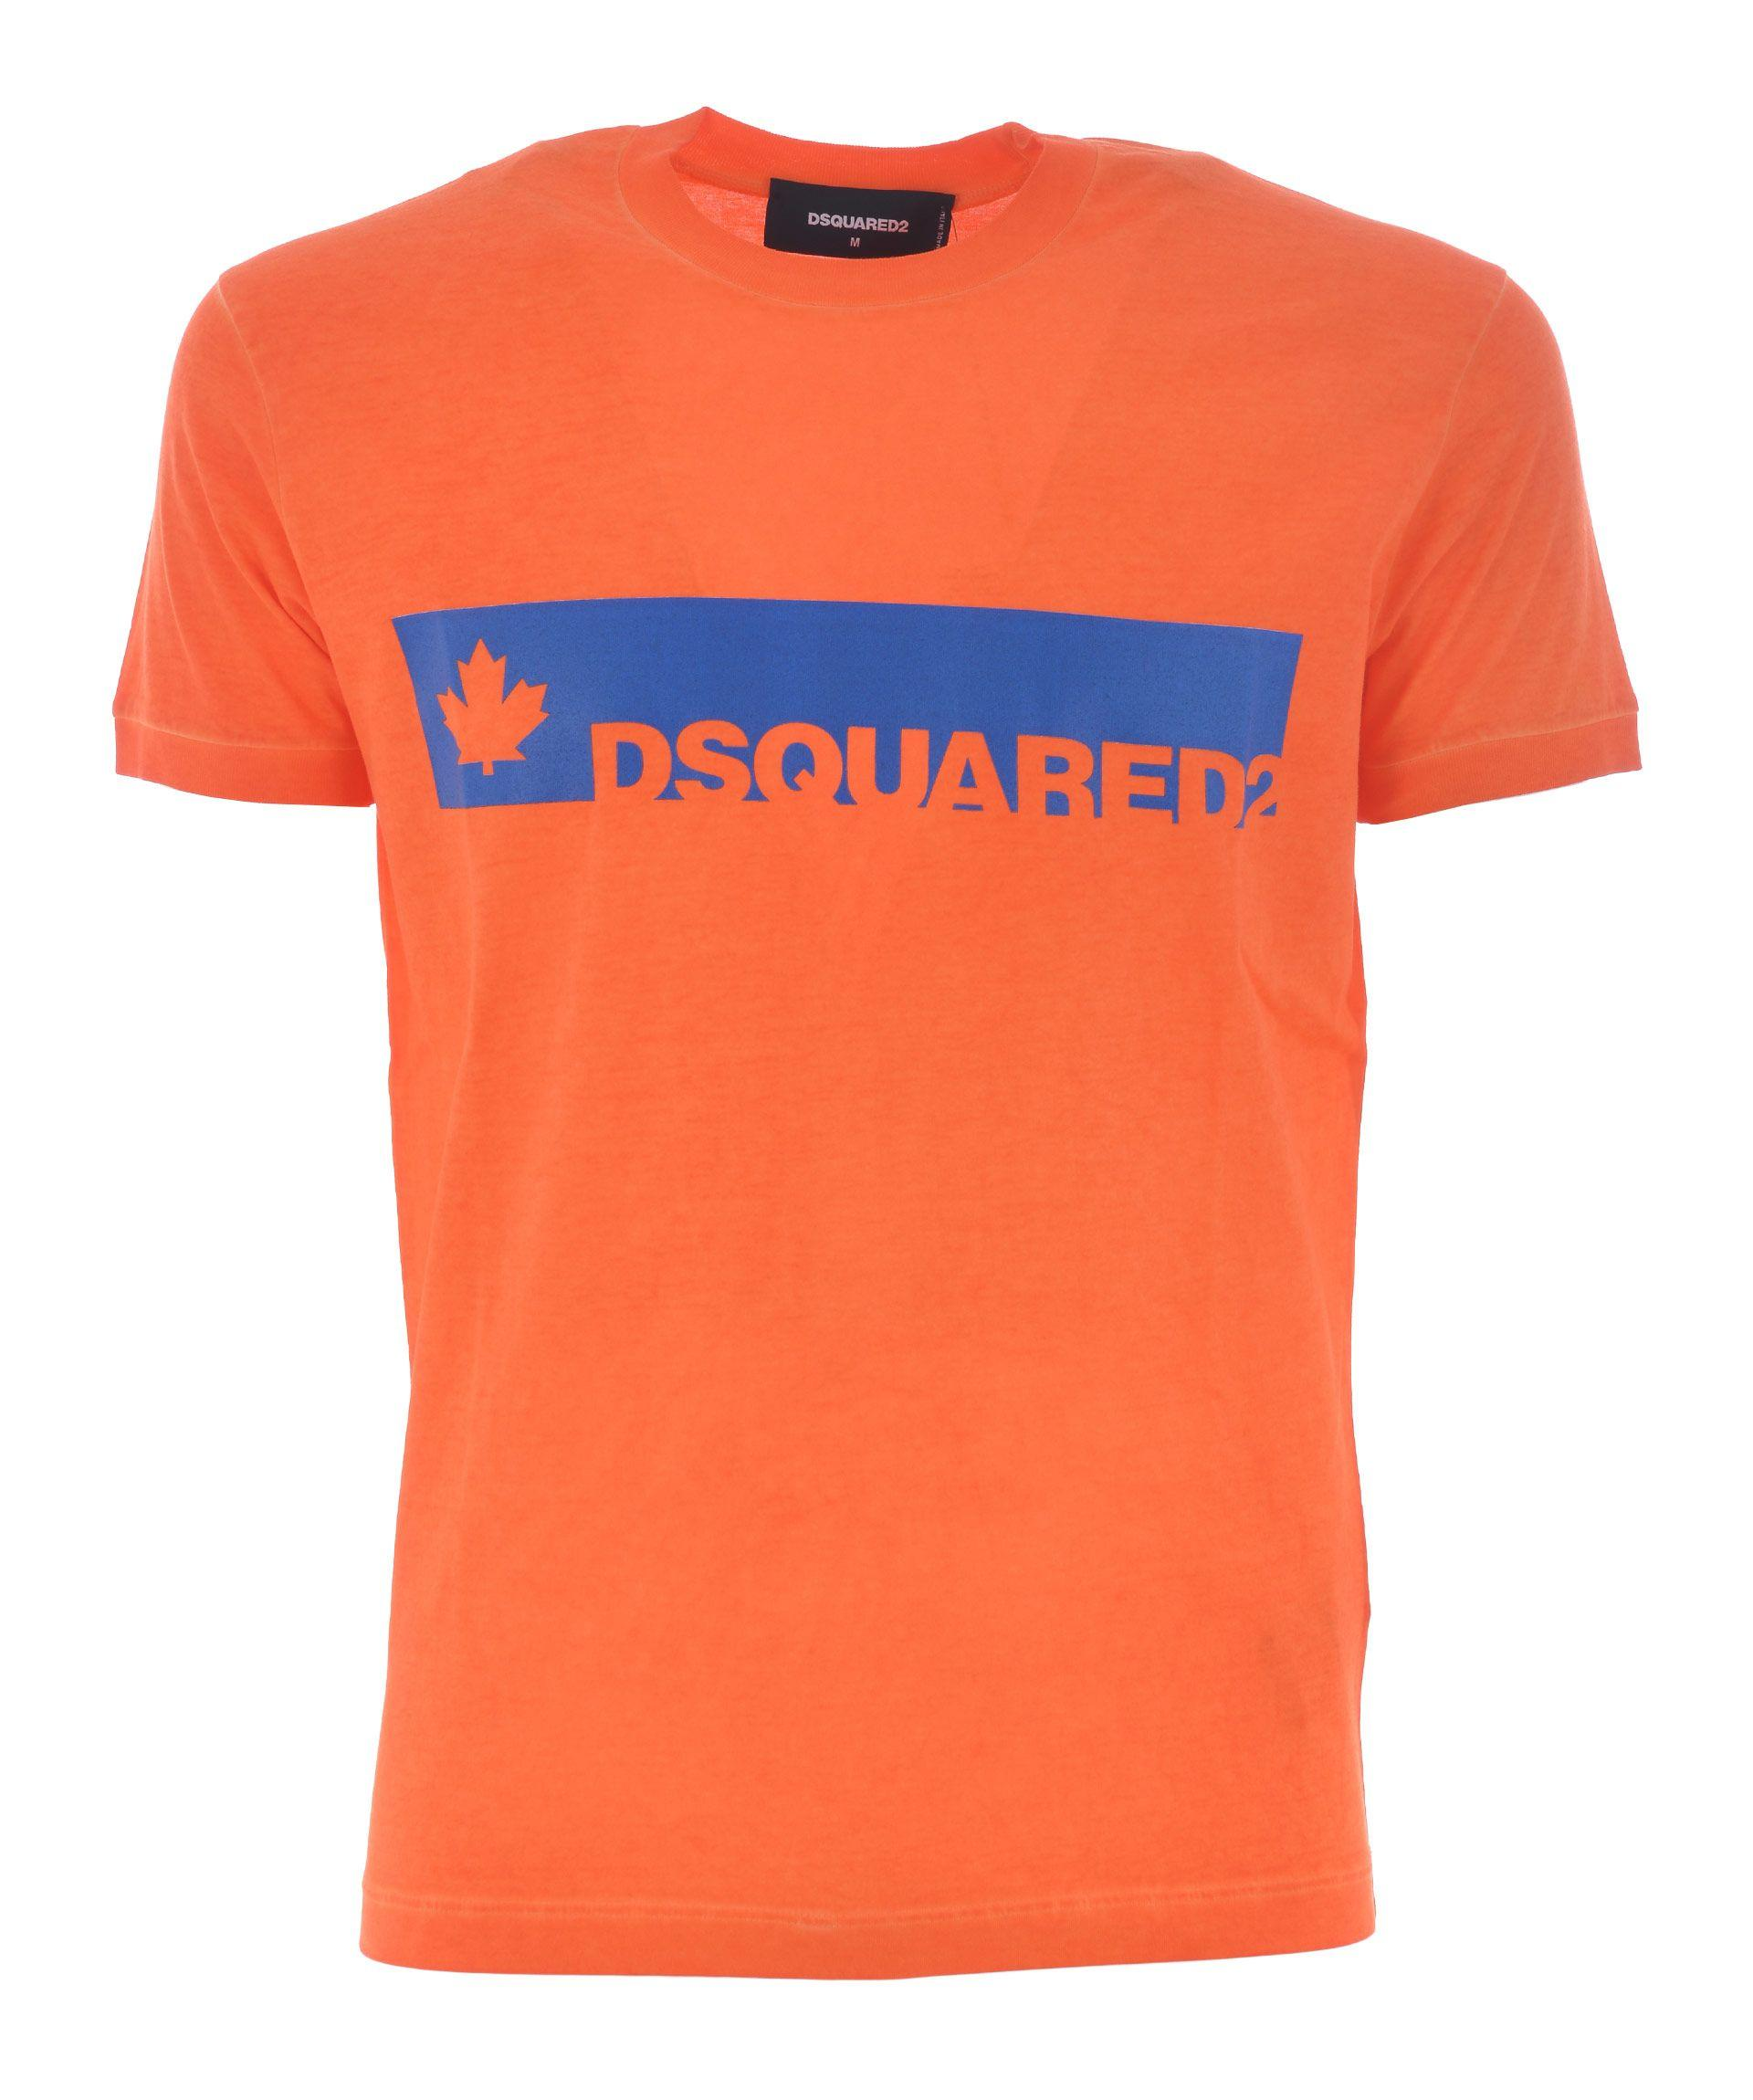 Dsquared2 Teal Logo T-Shirt In Arancio